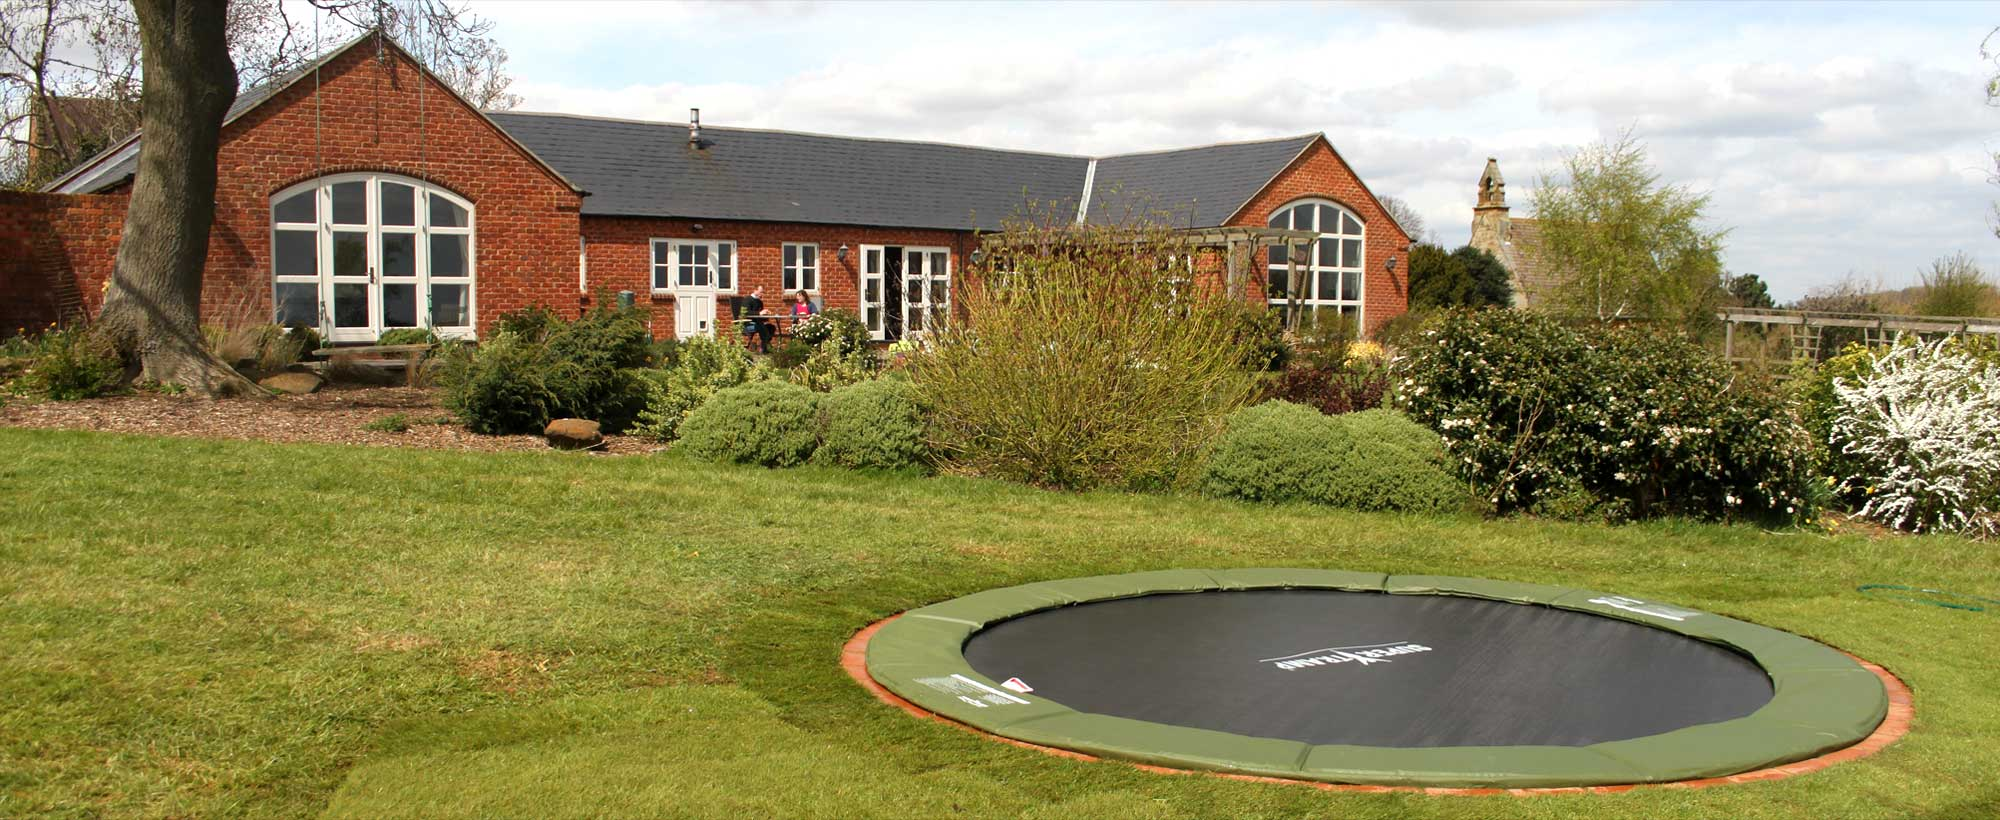 sunken-trampolines